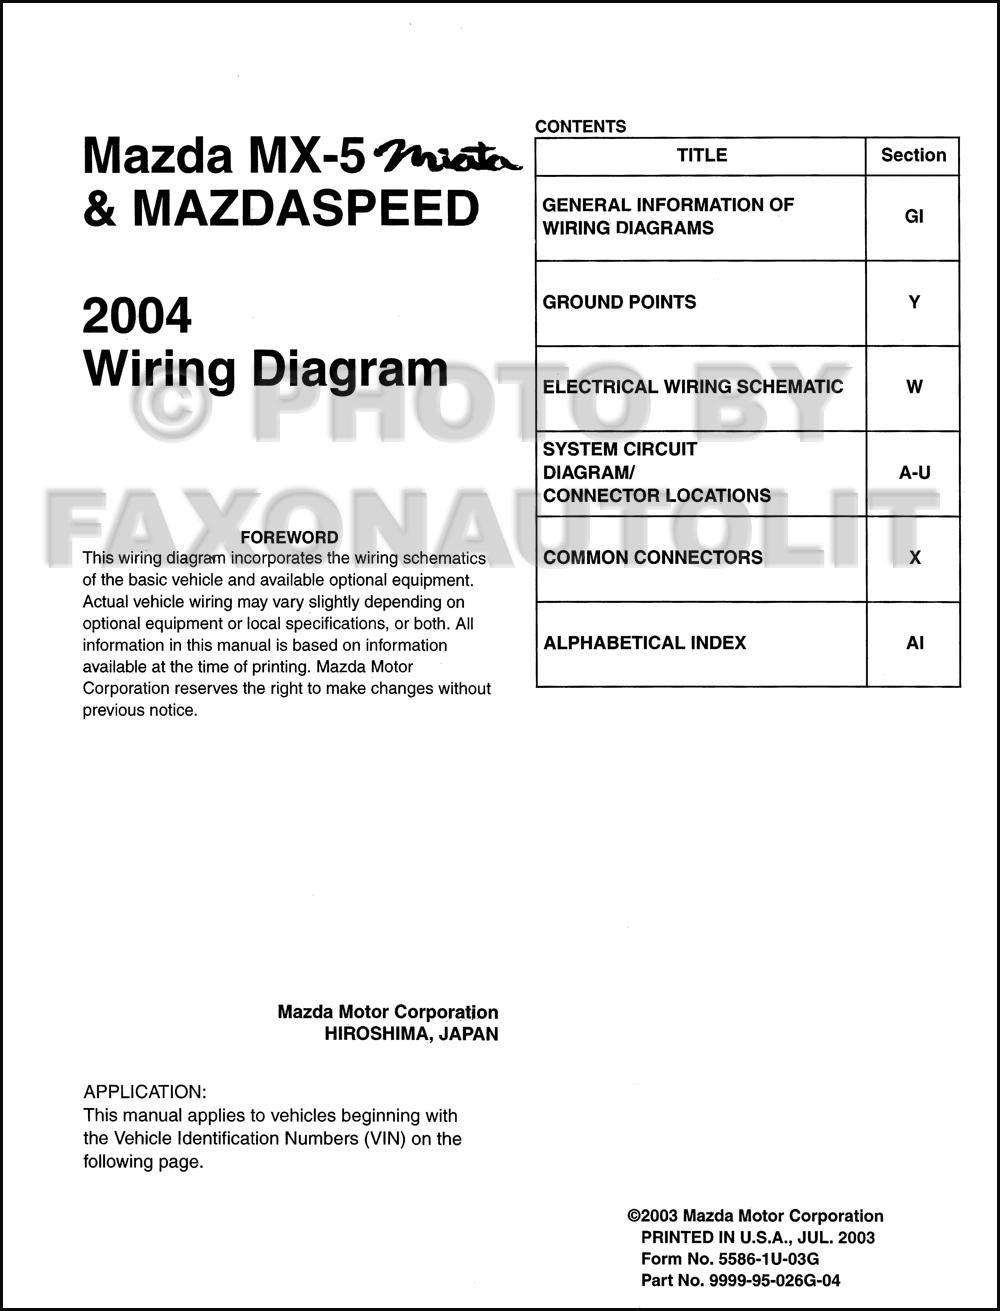 2004 miata radio wiring diagrams 1994 miata radio wiring diagram 2004 mazda mx-5 miata mazdaspeed wiring diagram manual ... #3